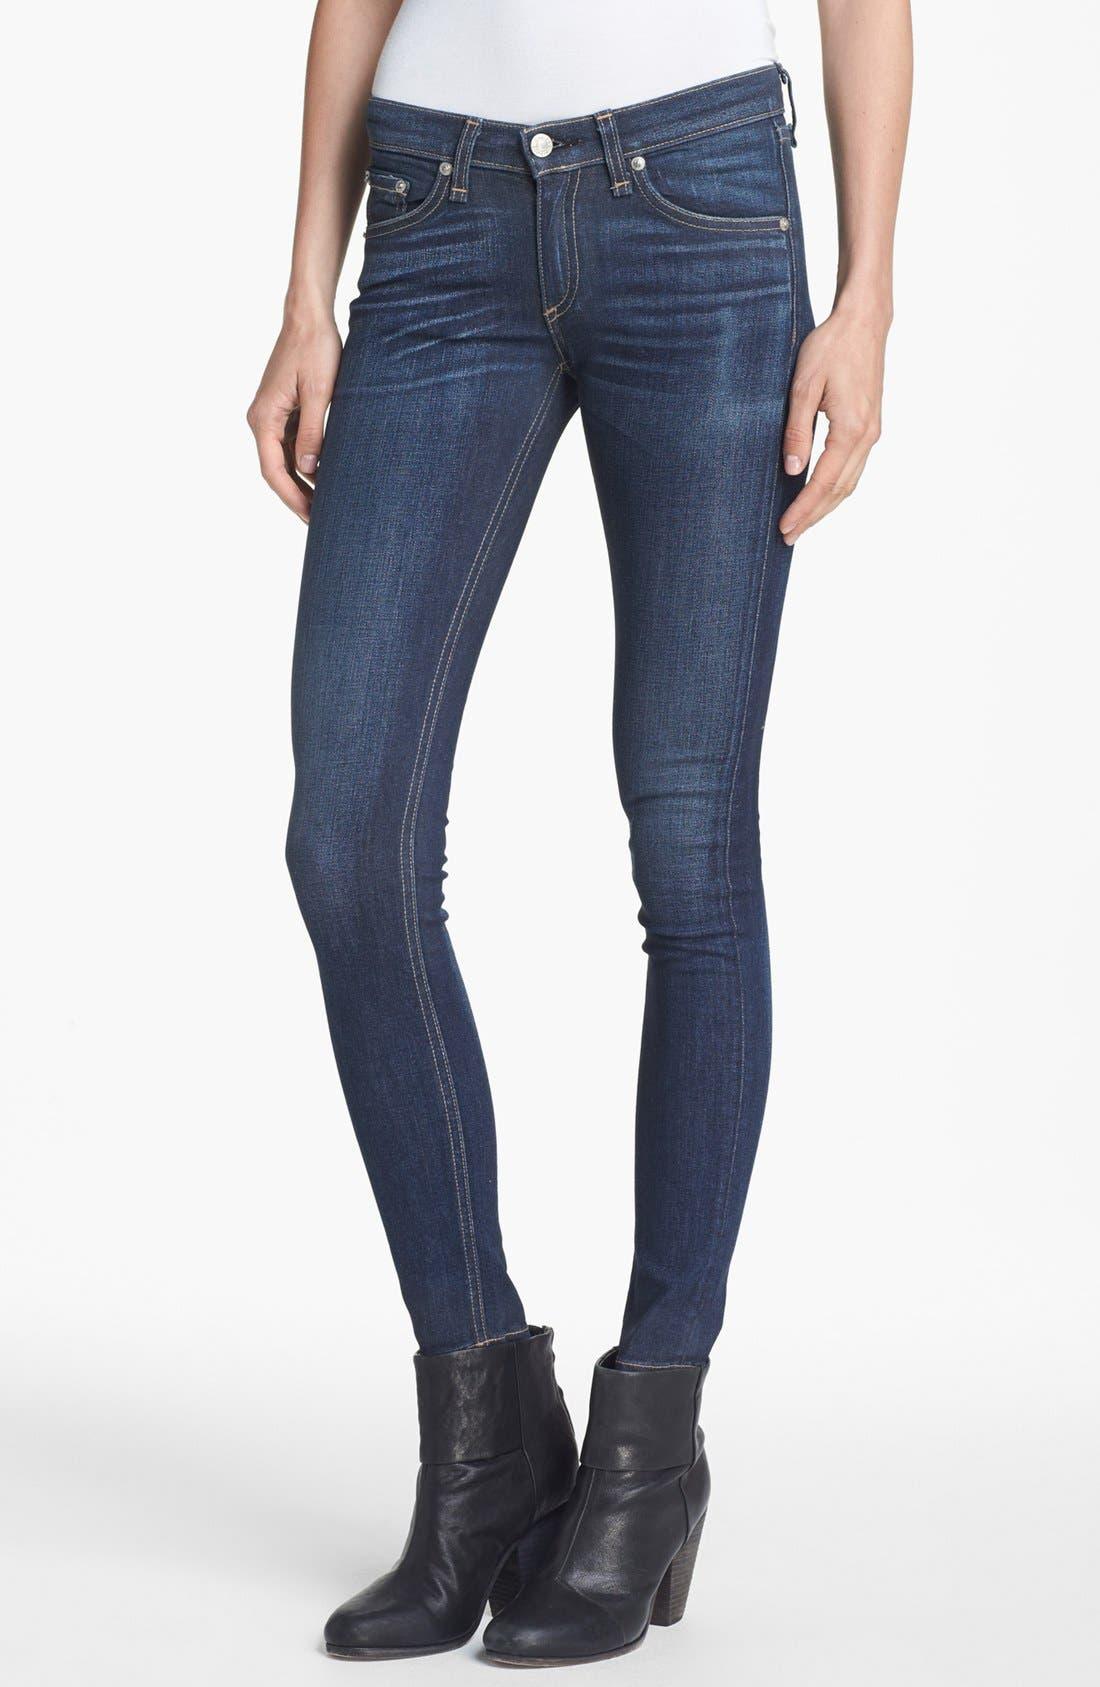 Main Image - rag & bone/JEAN Skinny Stretch Jeans (Clean Charing)